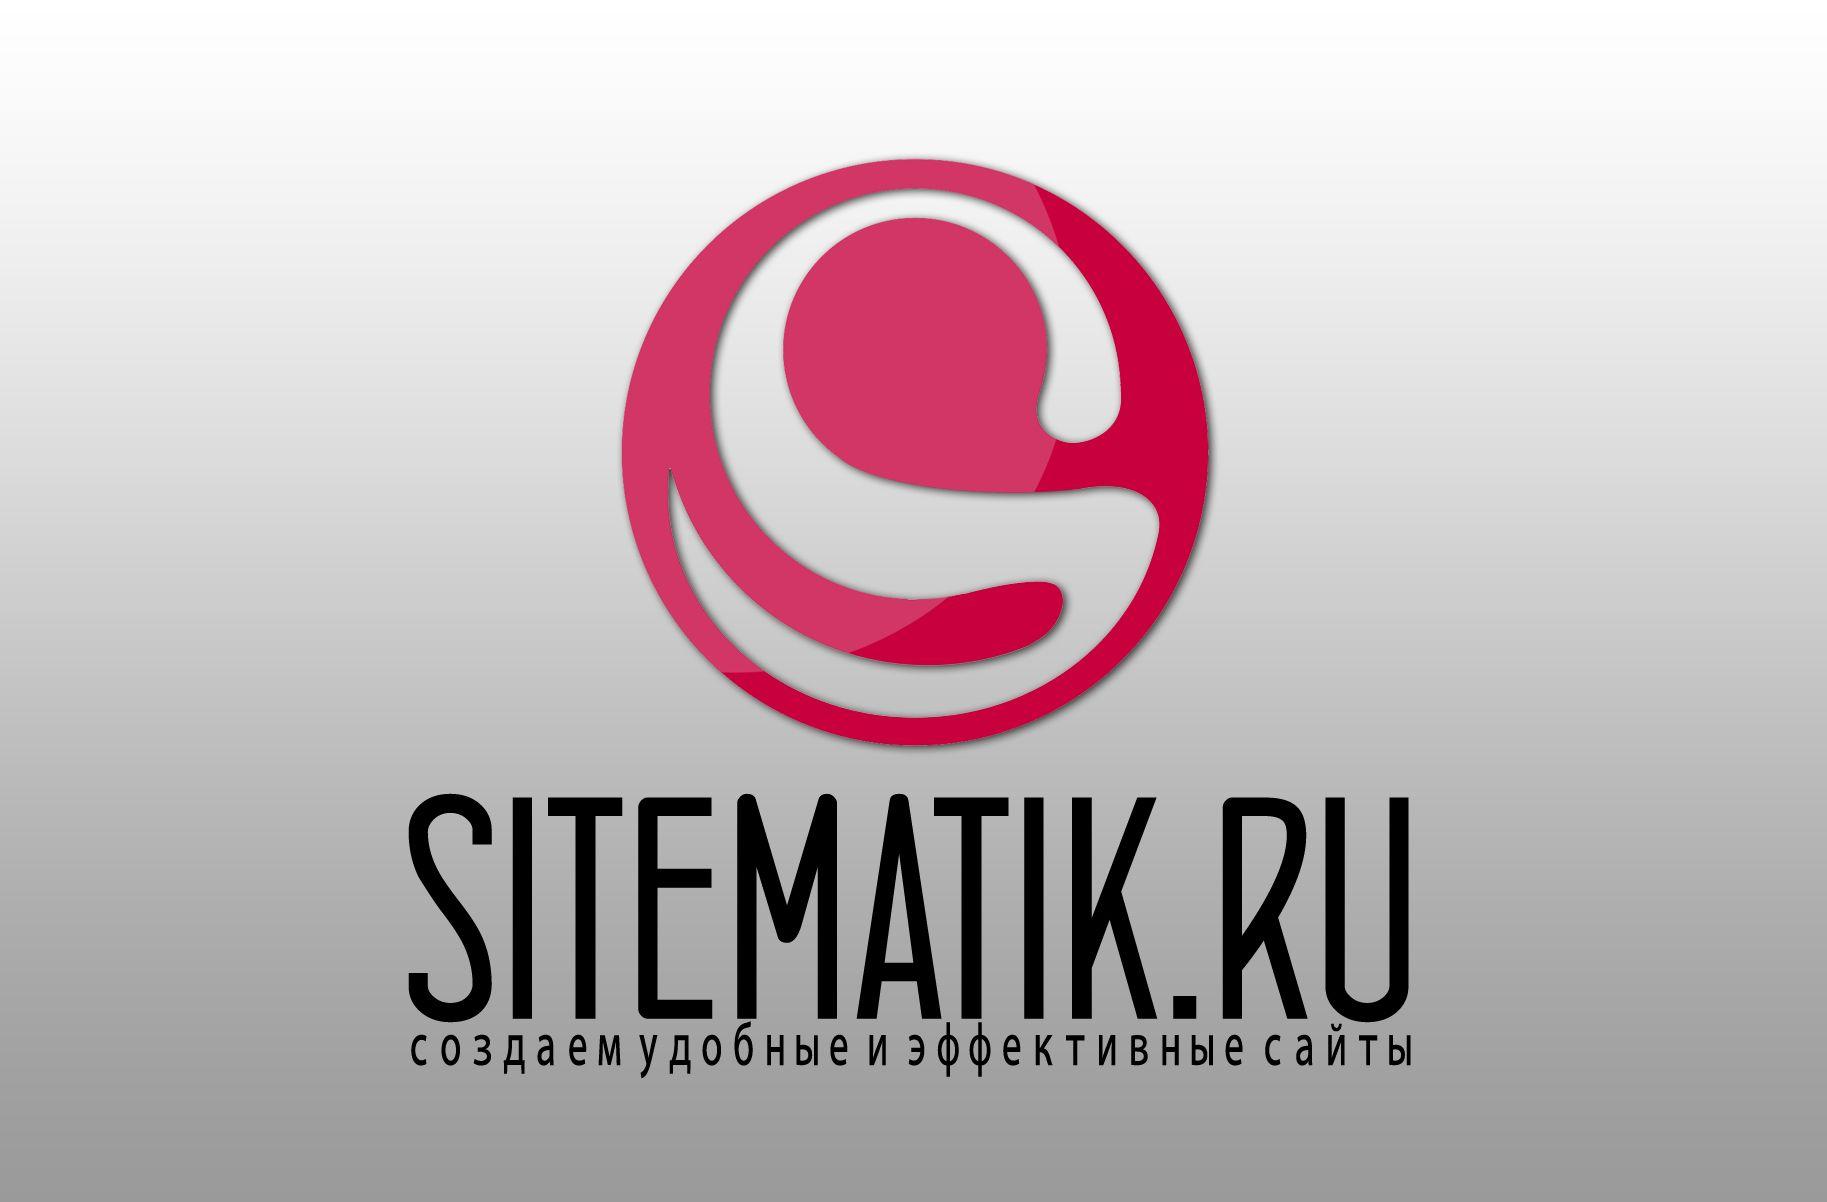 Логотип для Веб-студии - дизайнер TwinSpleen